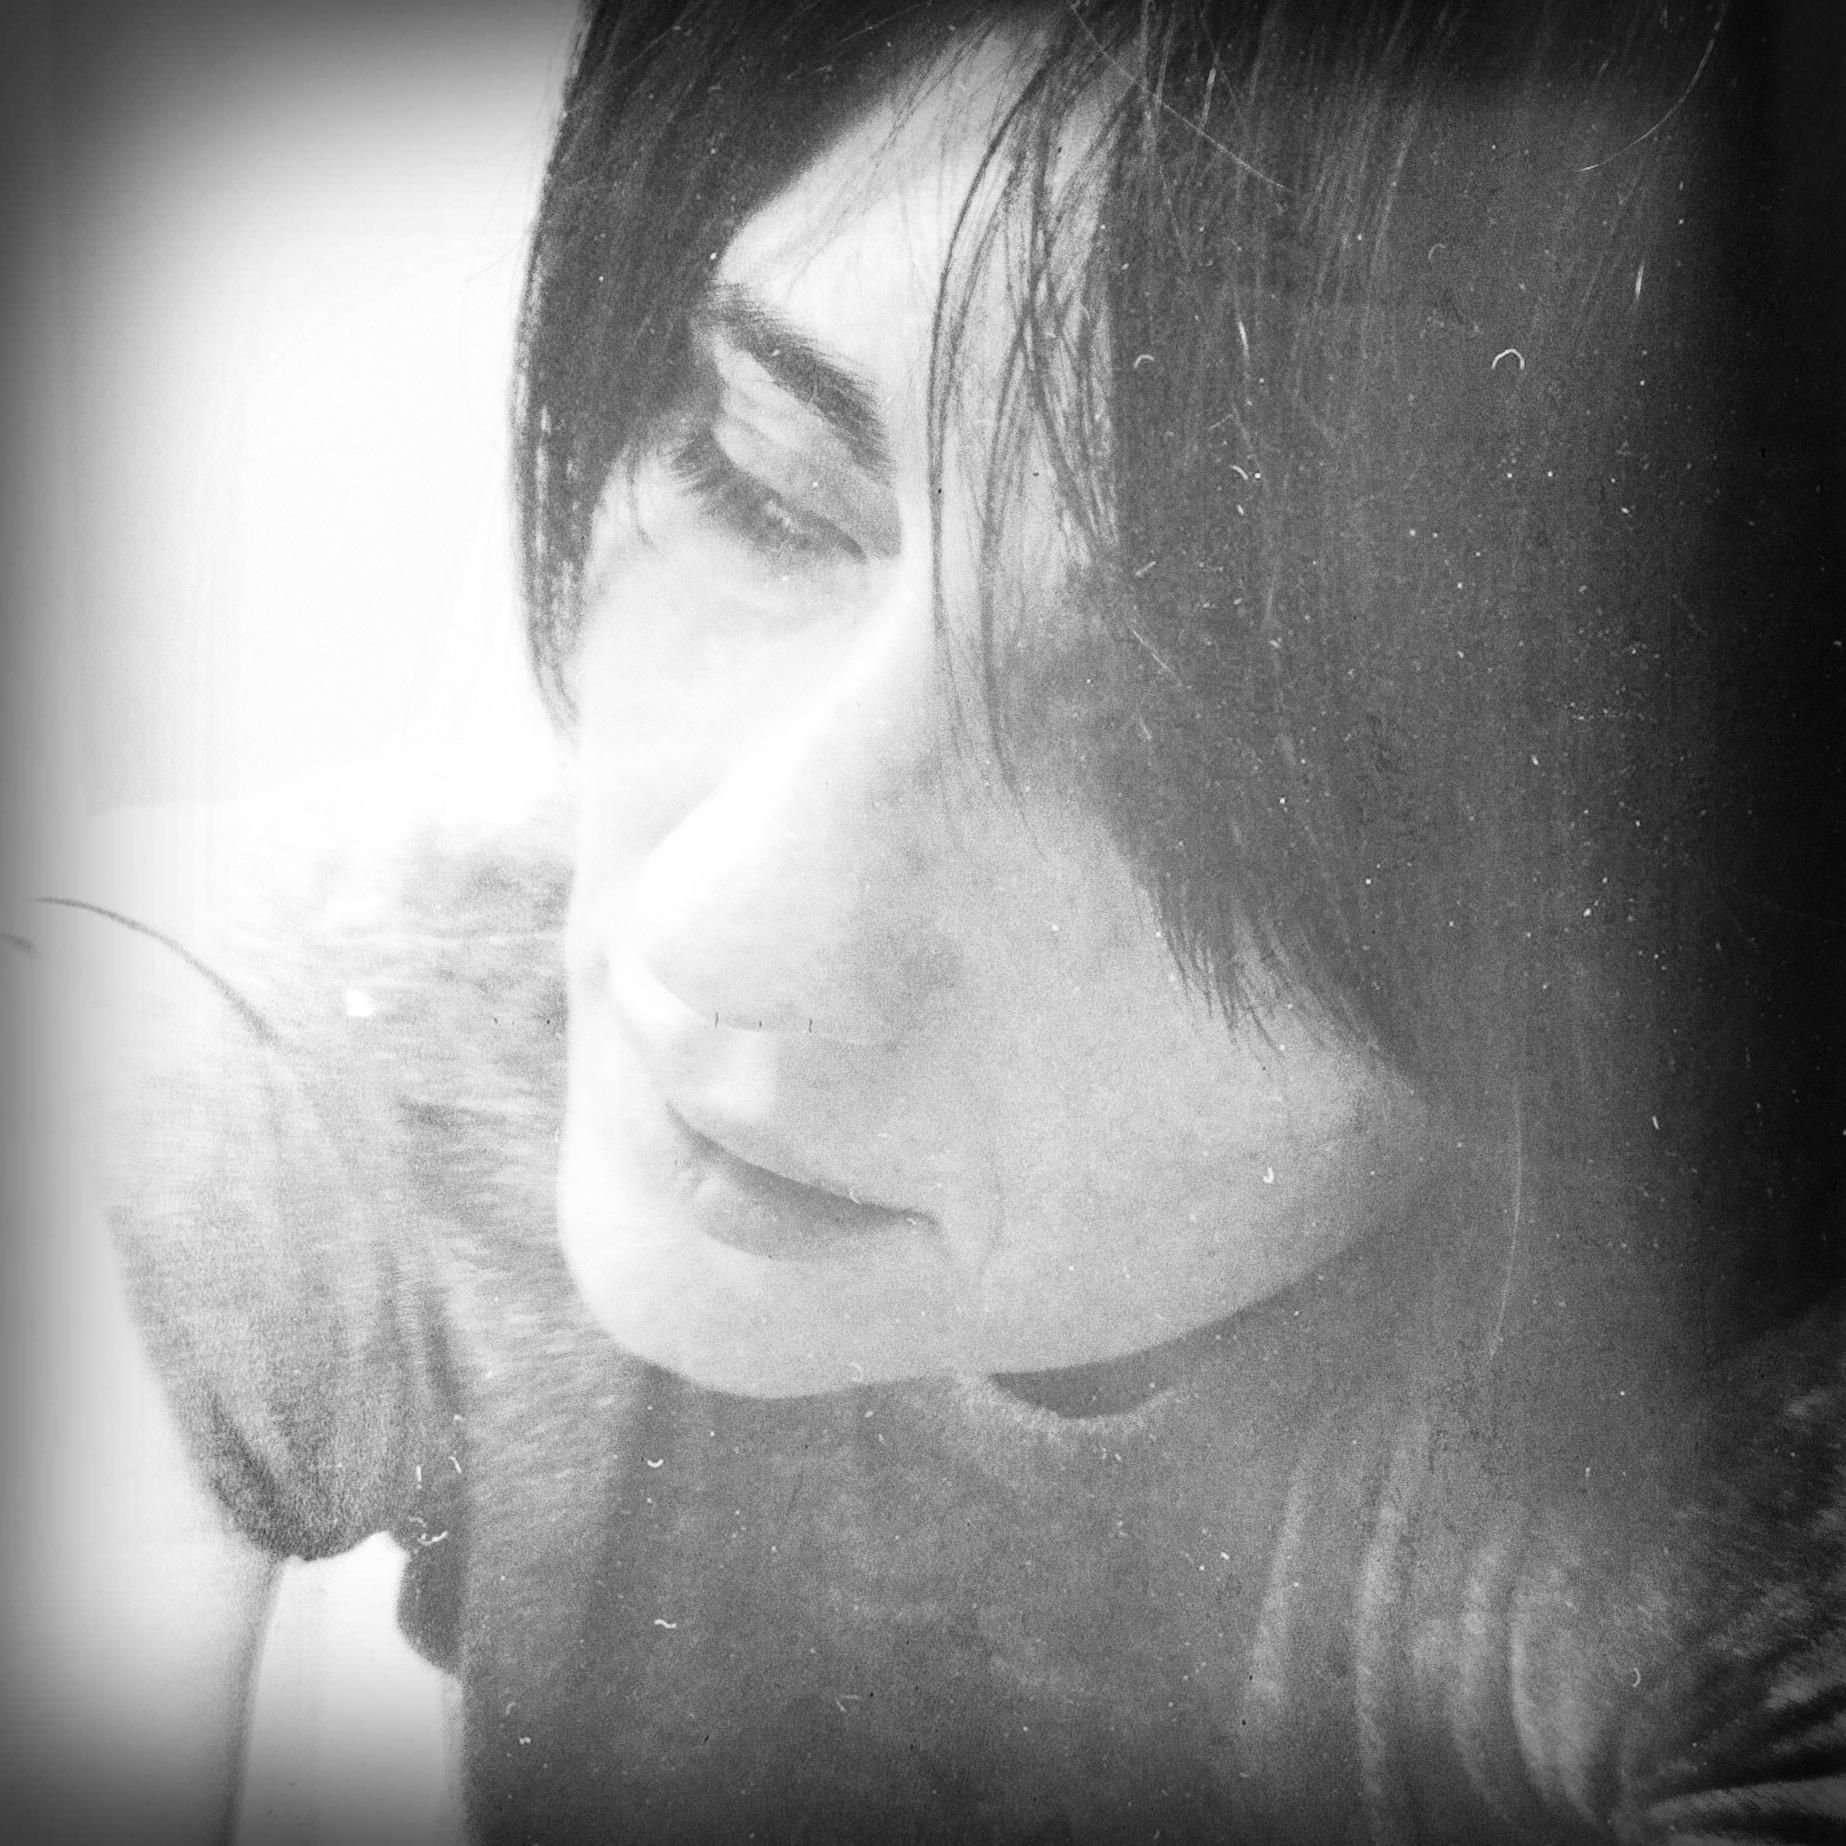 Carolin_Window_writer.jpg